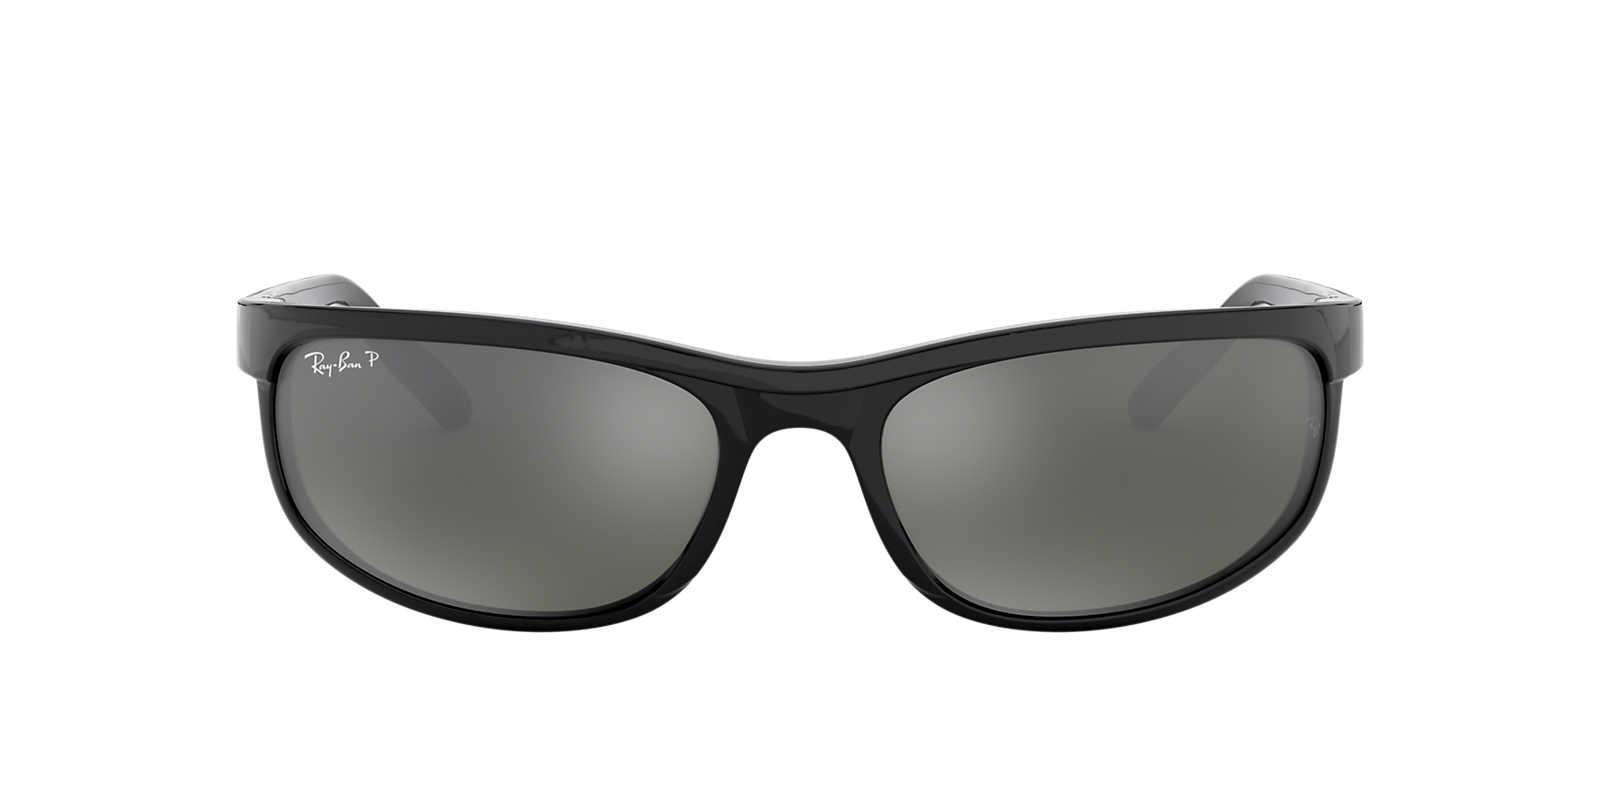 910309ddc1 RAY-BAN Black RB2027 62 PREDATOR 2 Grey polarized lenses 62mm